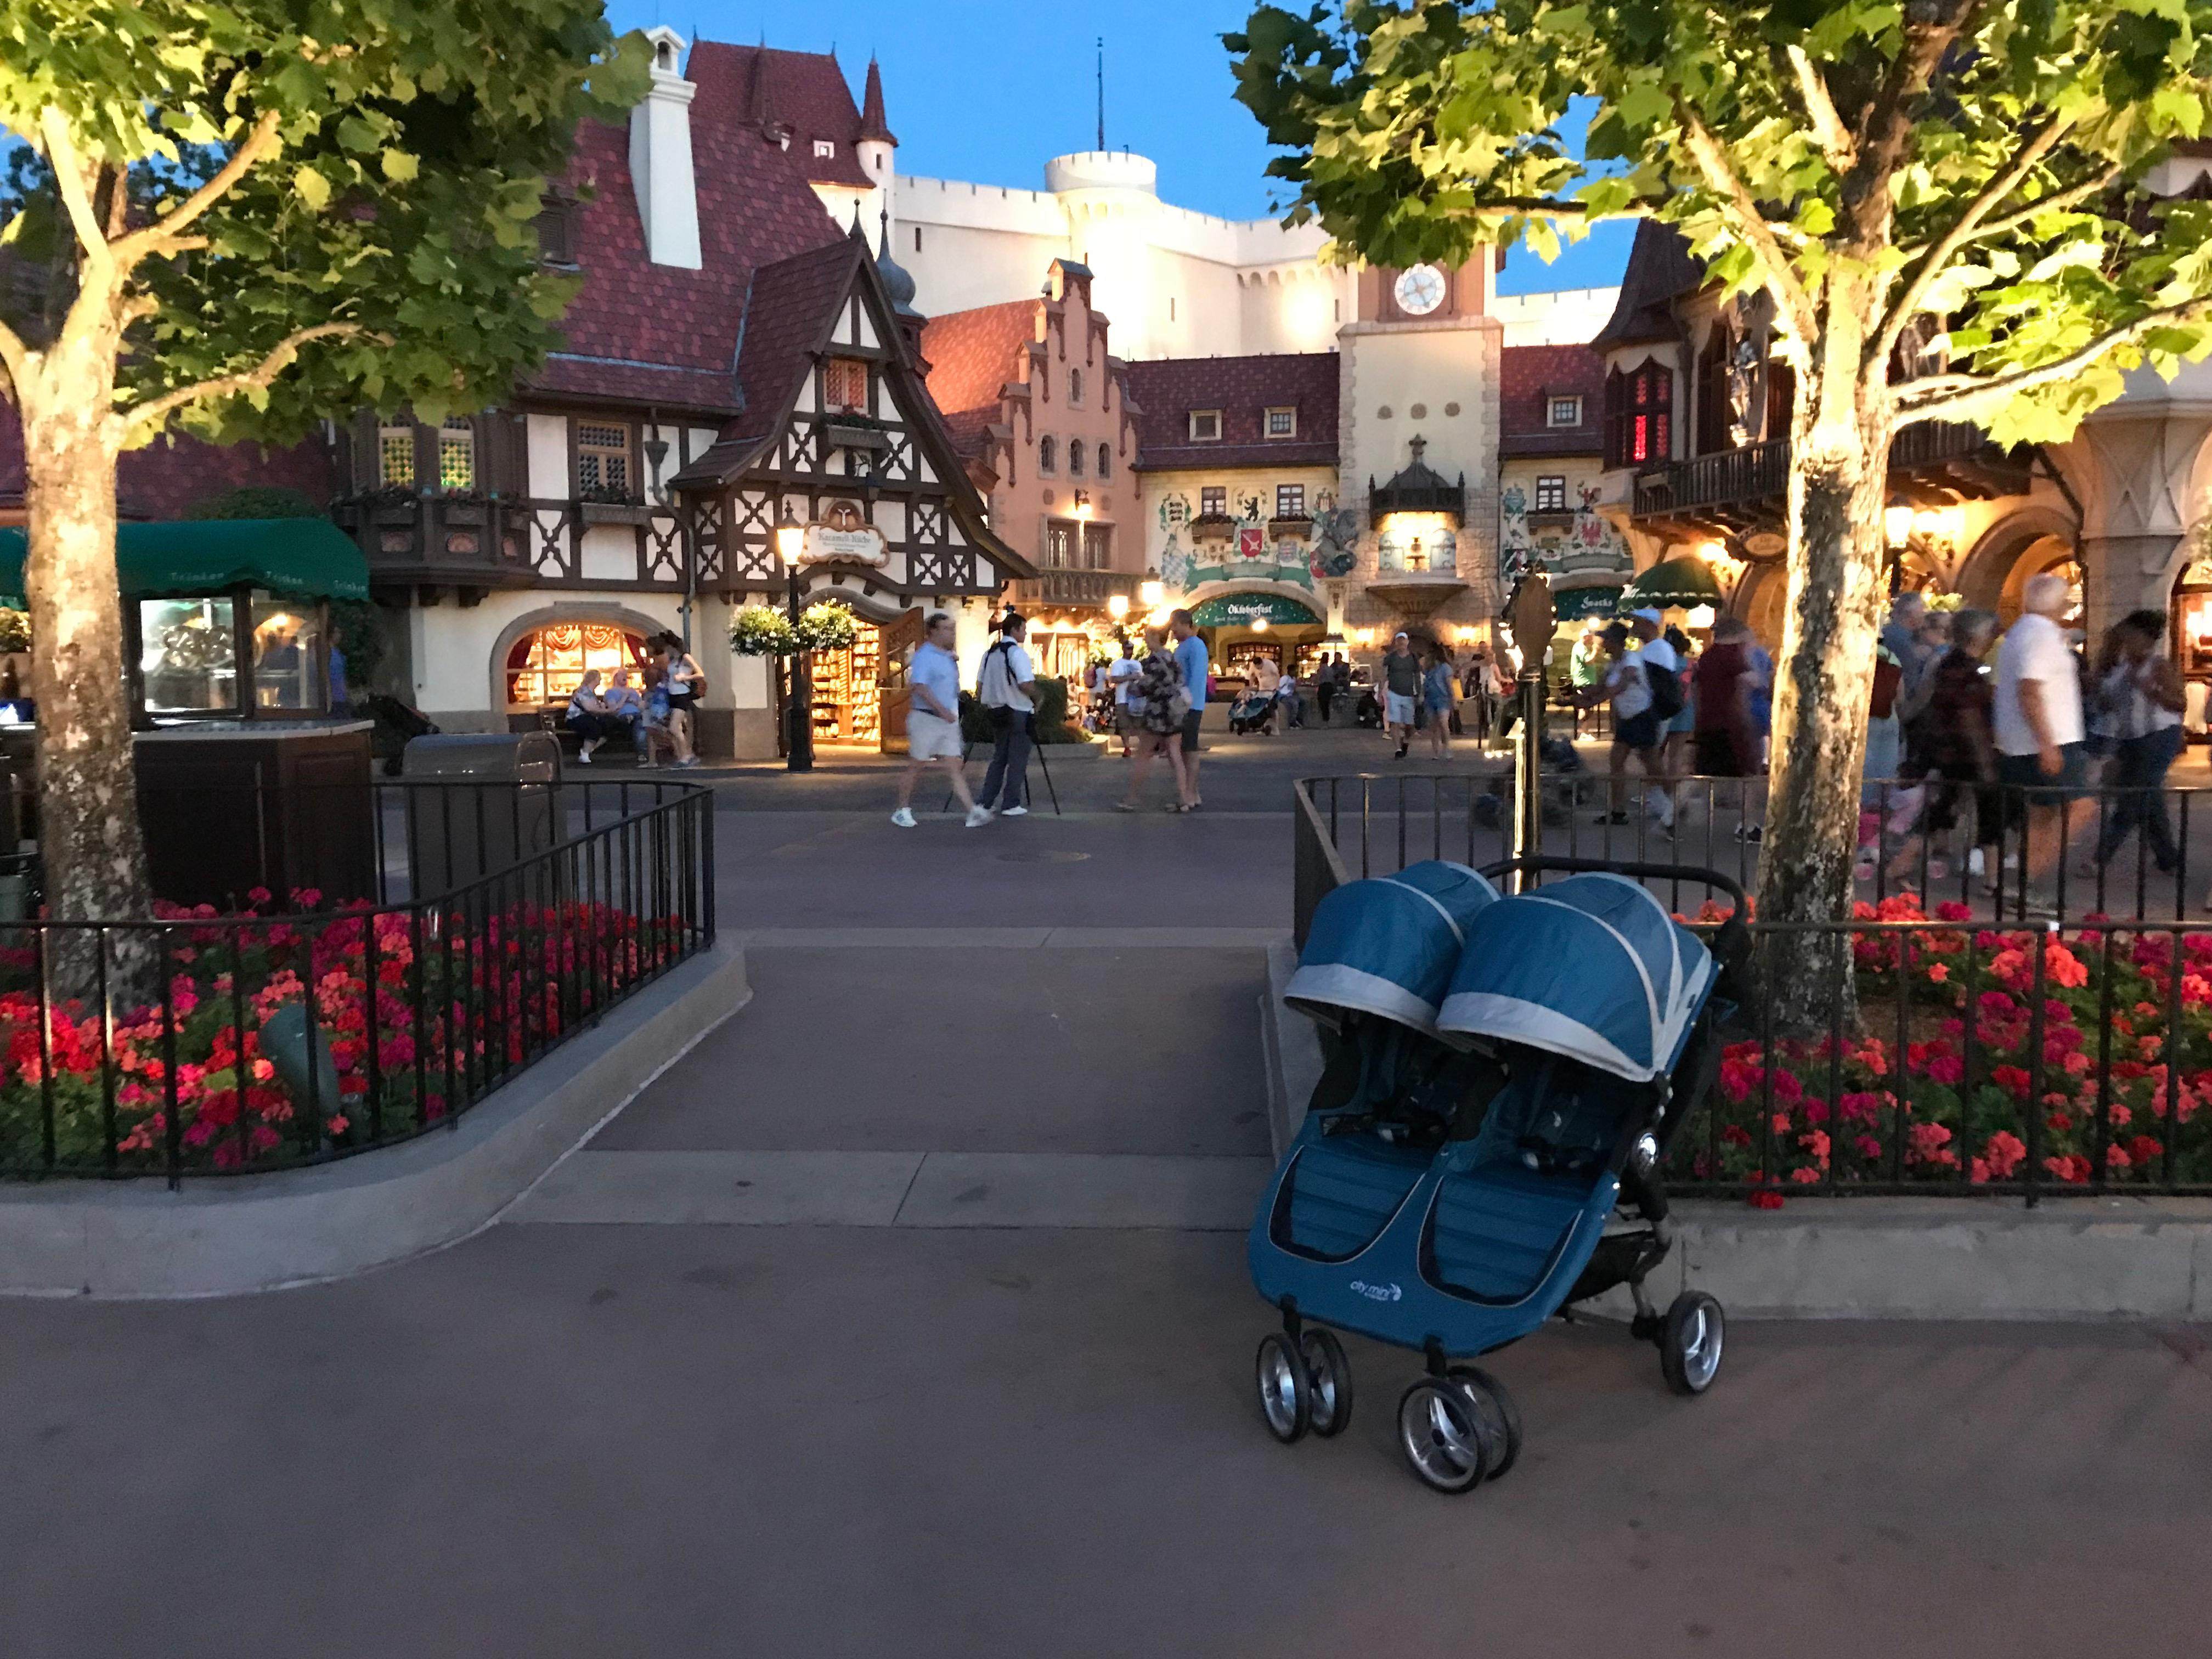 Stroller Rentals Disney image 43